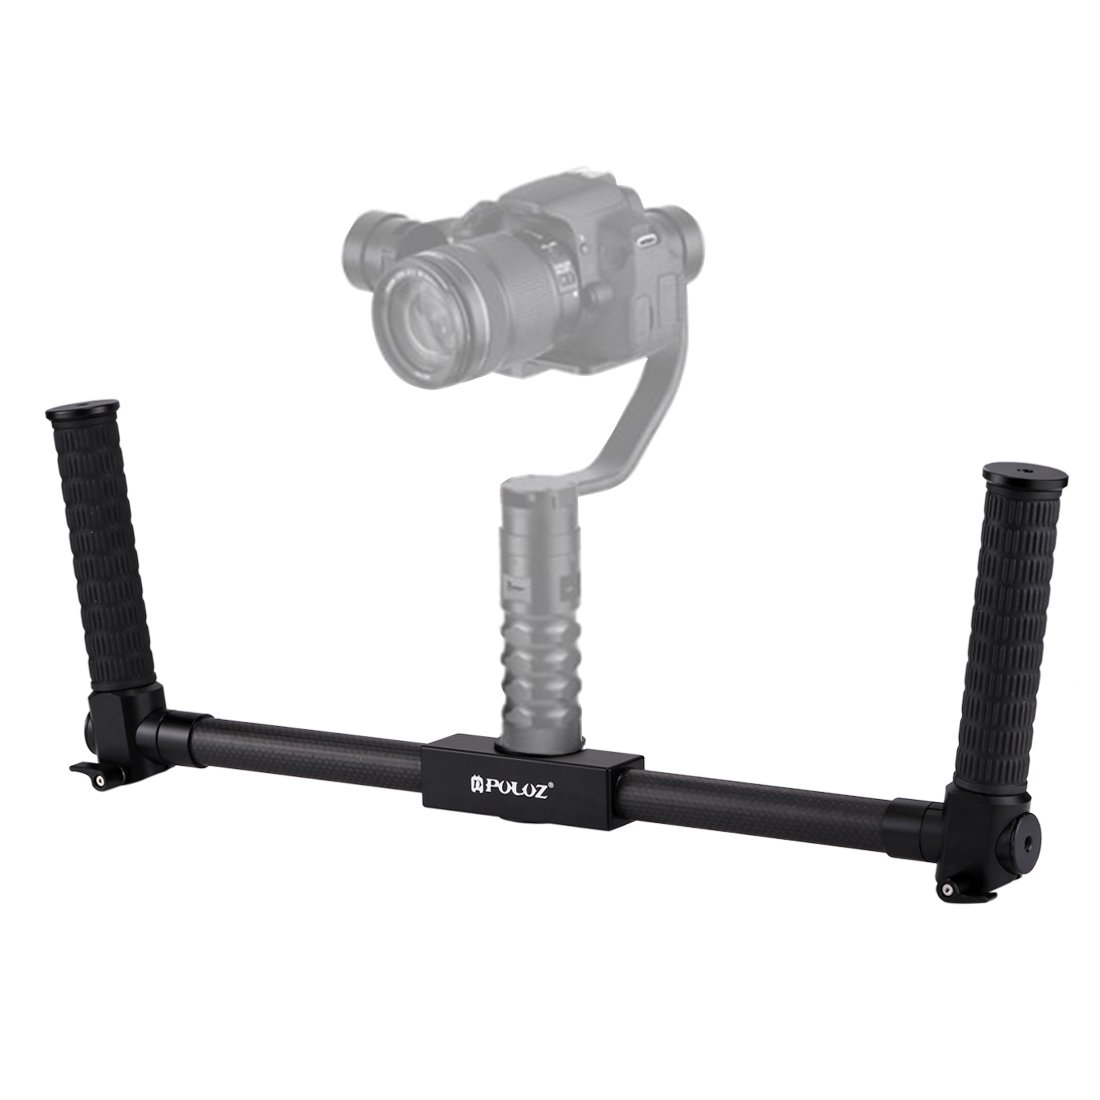 XIAOMIN Dual Handheld Grip Aluminum Tube Stabilizer Premium Material by XIAOMIN